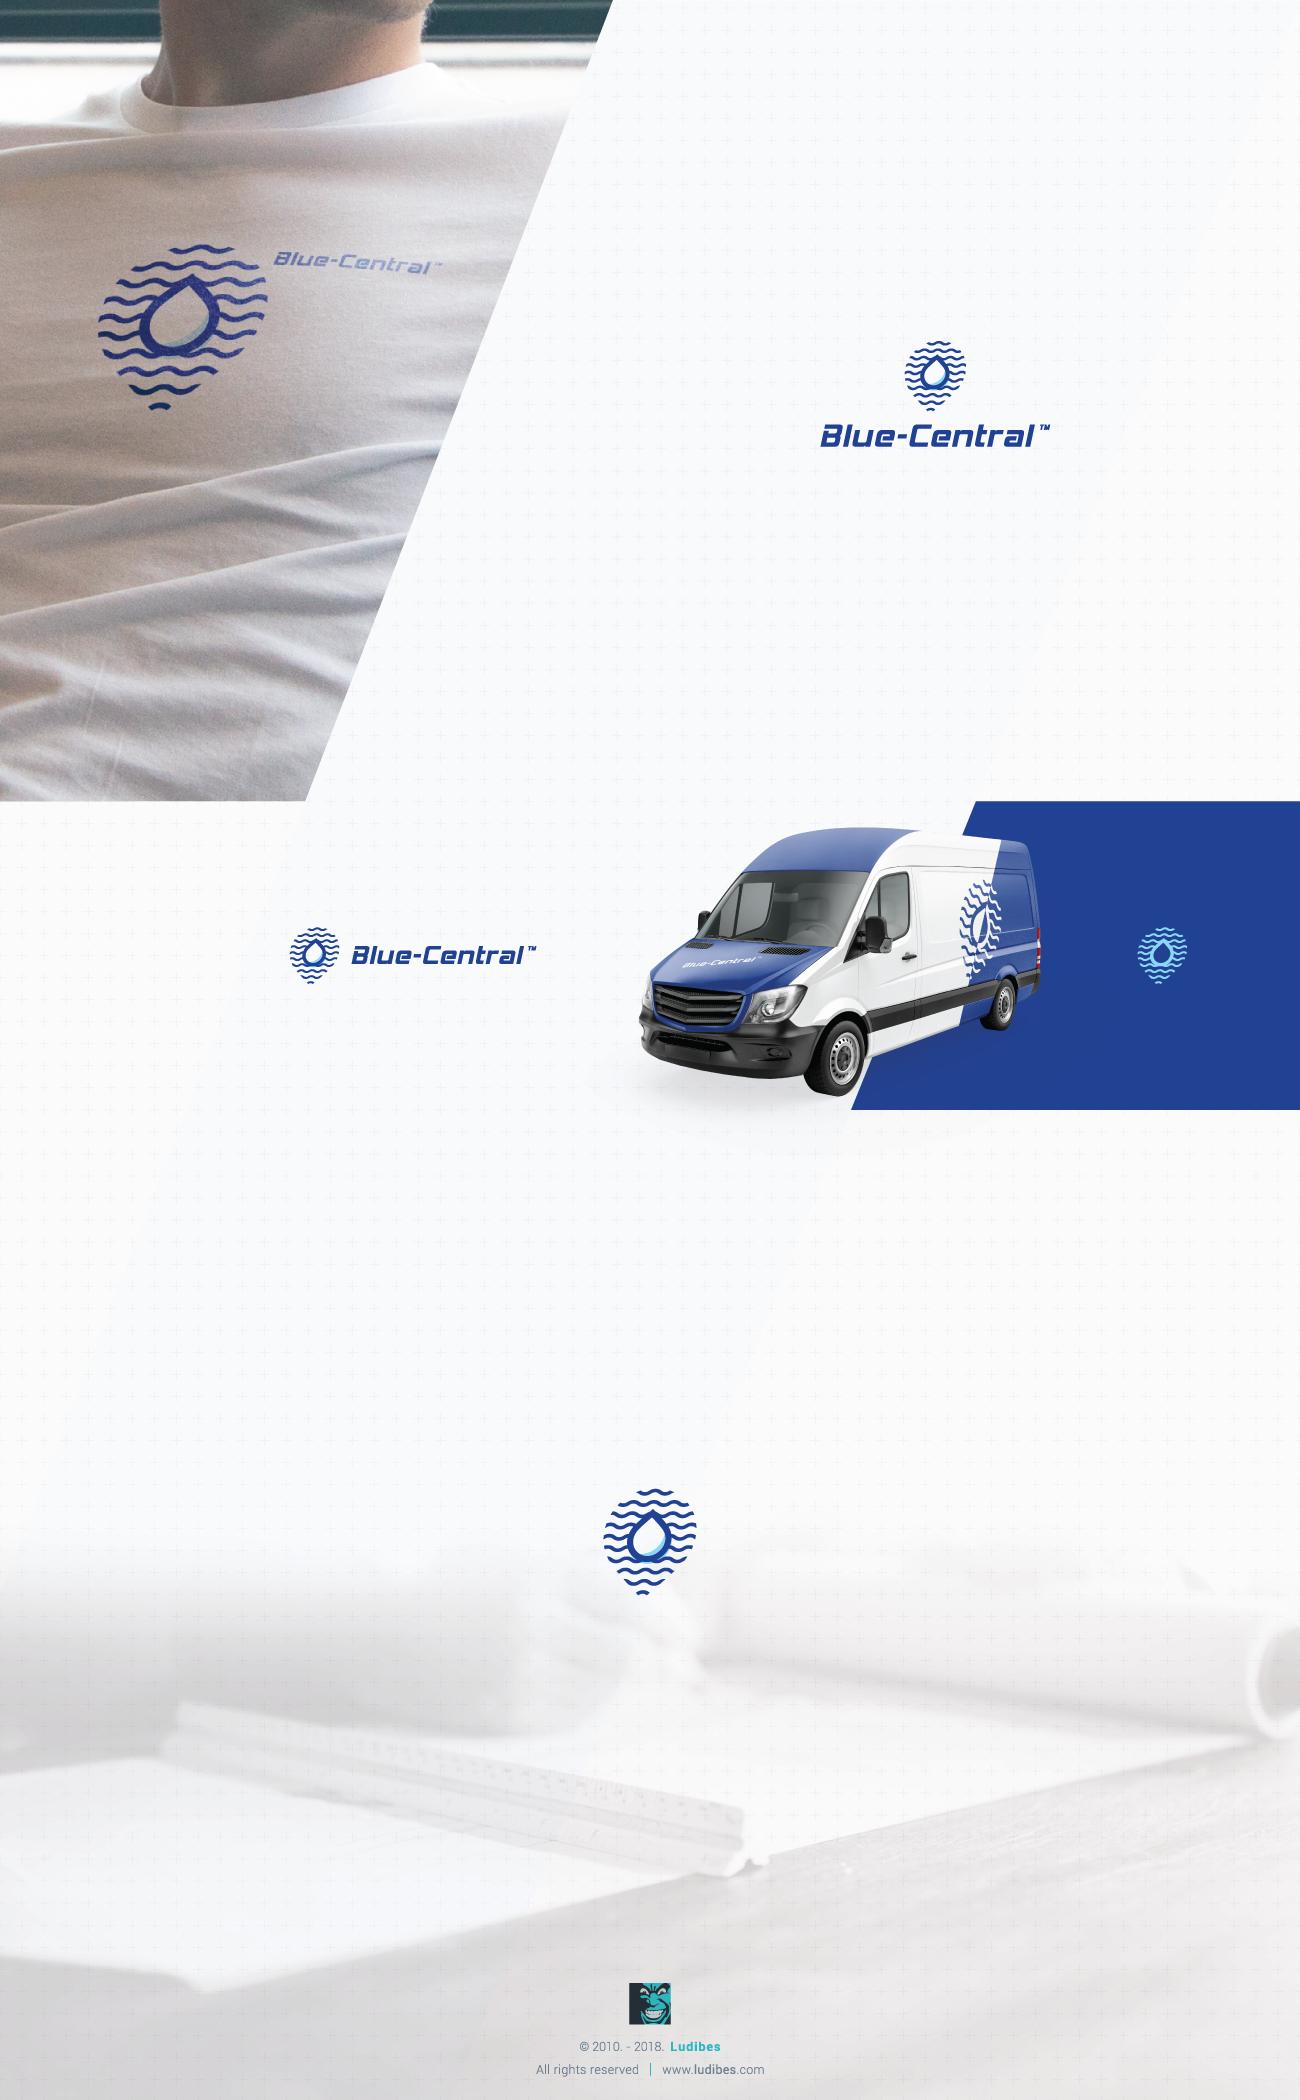 Blue-Central logo